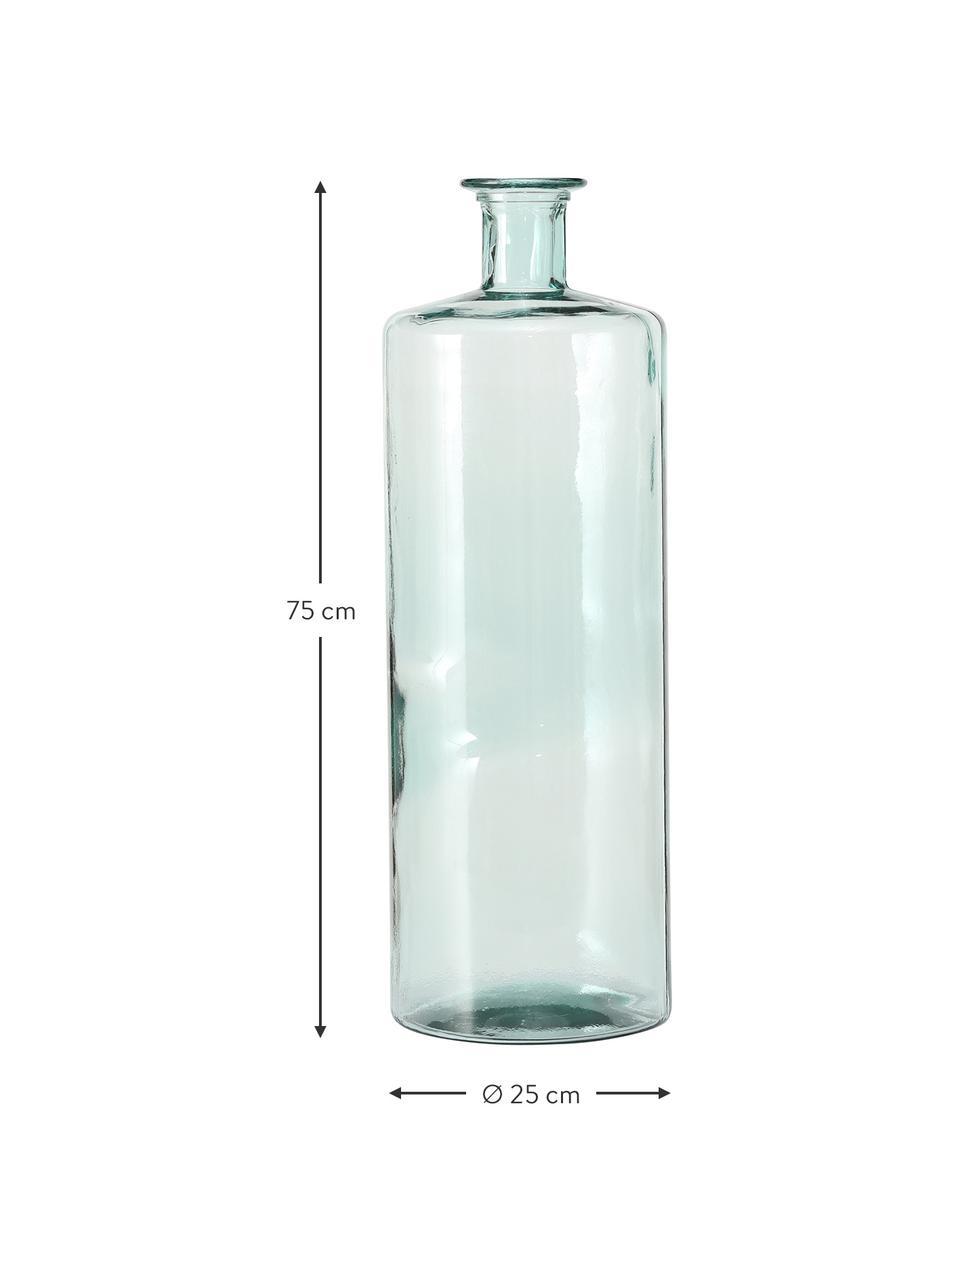 Bodenvase Pavlo aus recyceltem Glas, Glas, recycelt, Grün, Ø 25 x H 75 cm